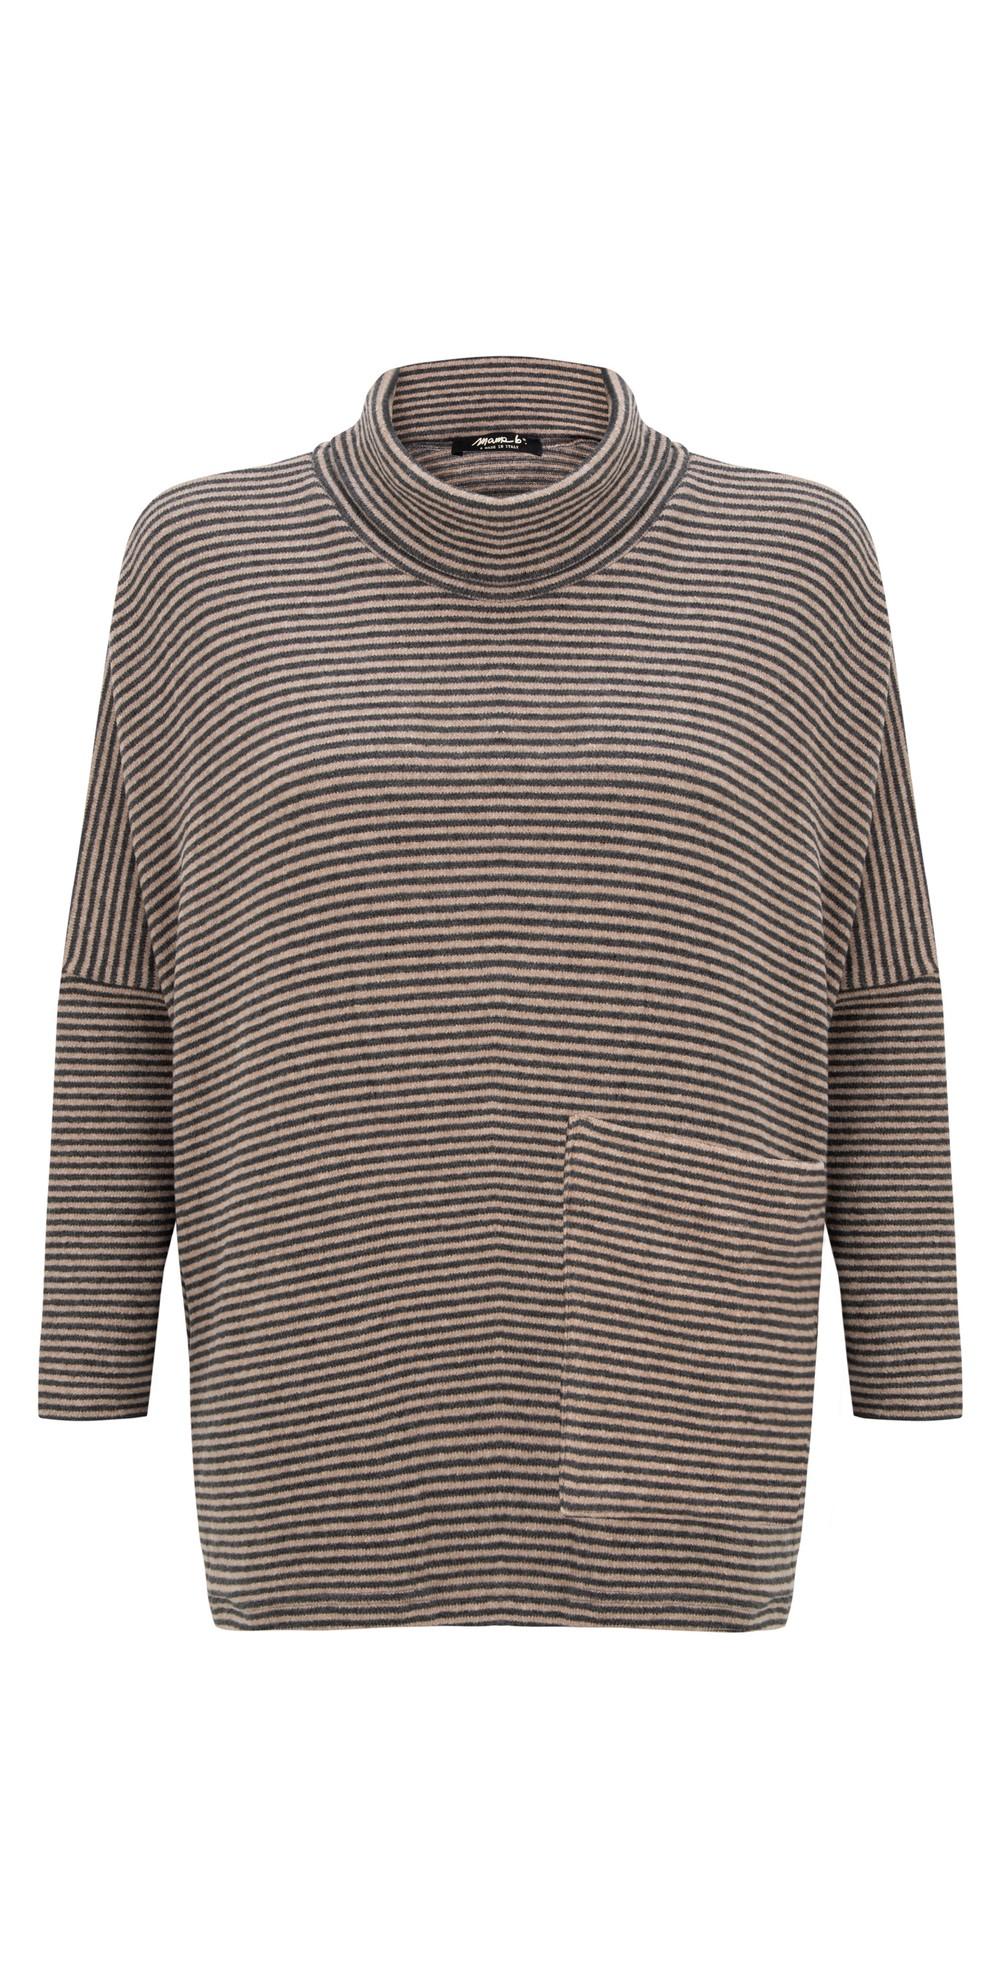 Bigne M Narrow Stripe Fleece Jumper main image